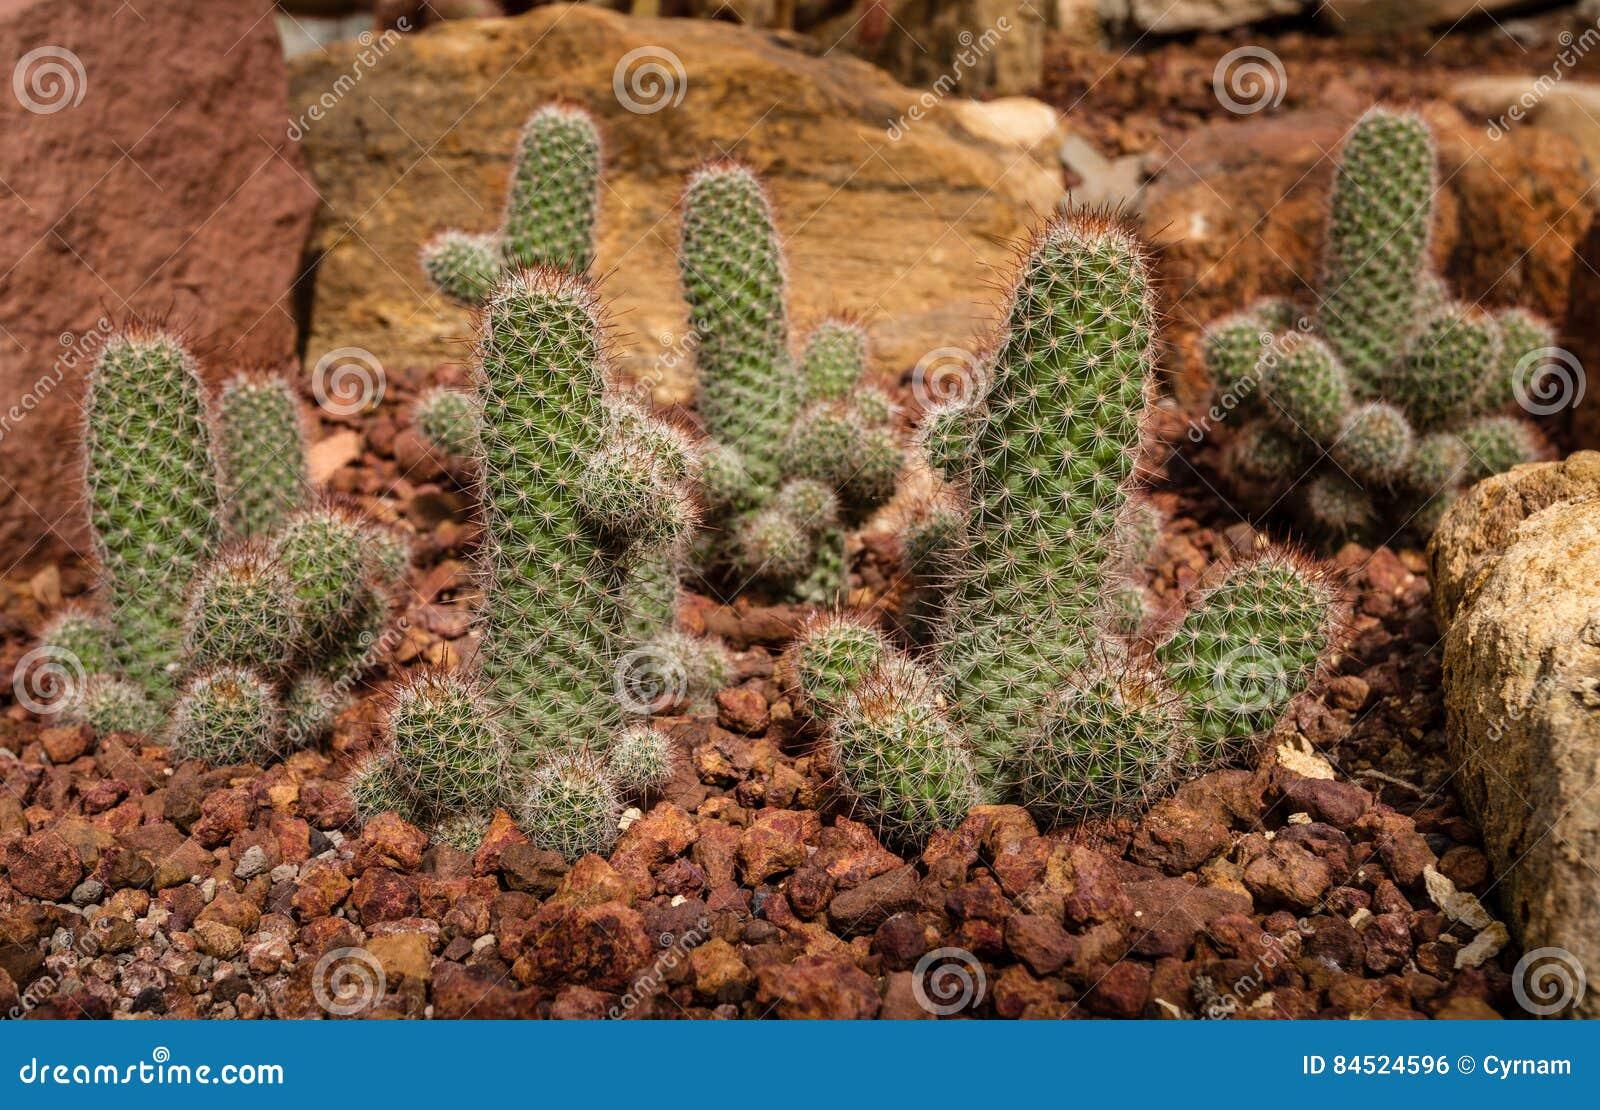 Beautiful cactus with phallic shape in rocky garden